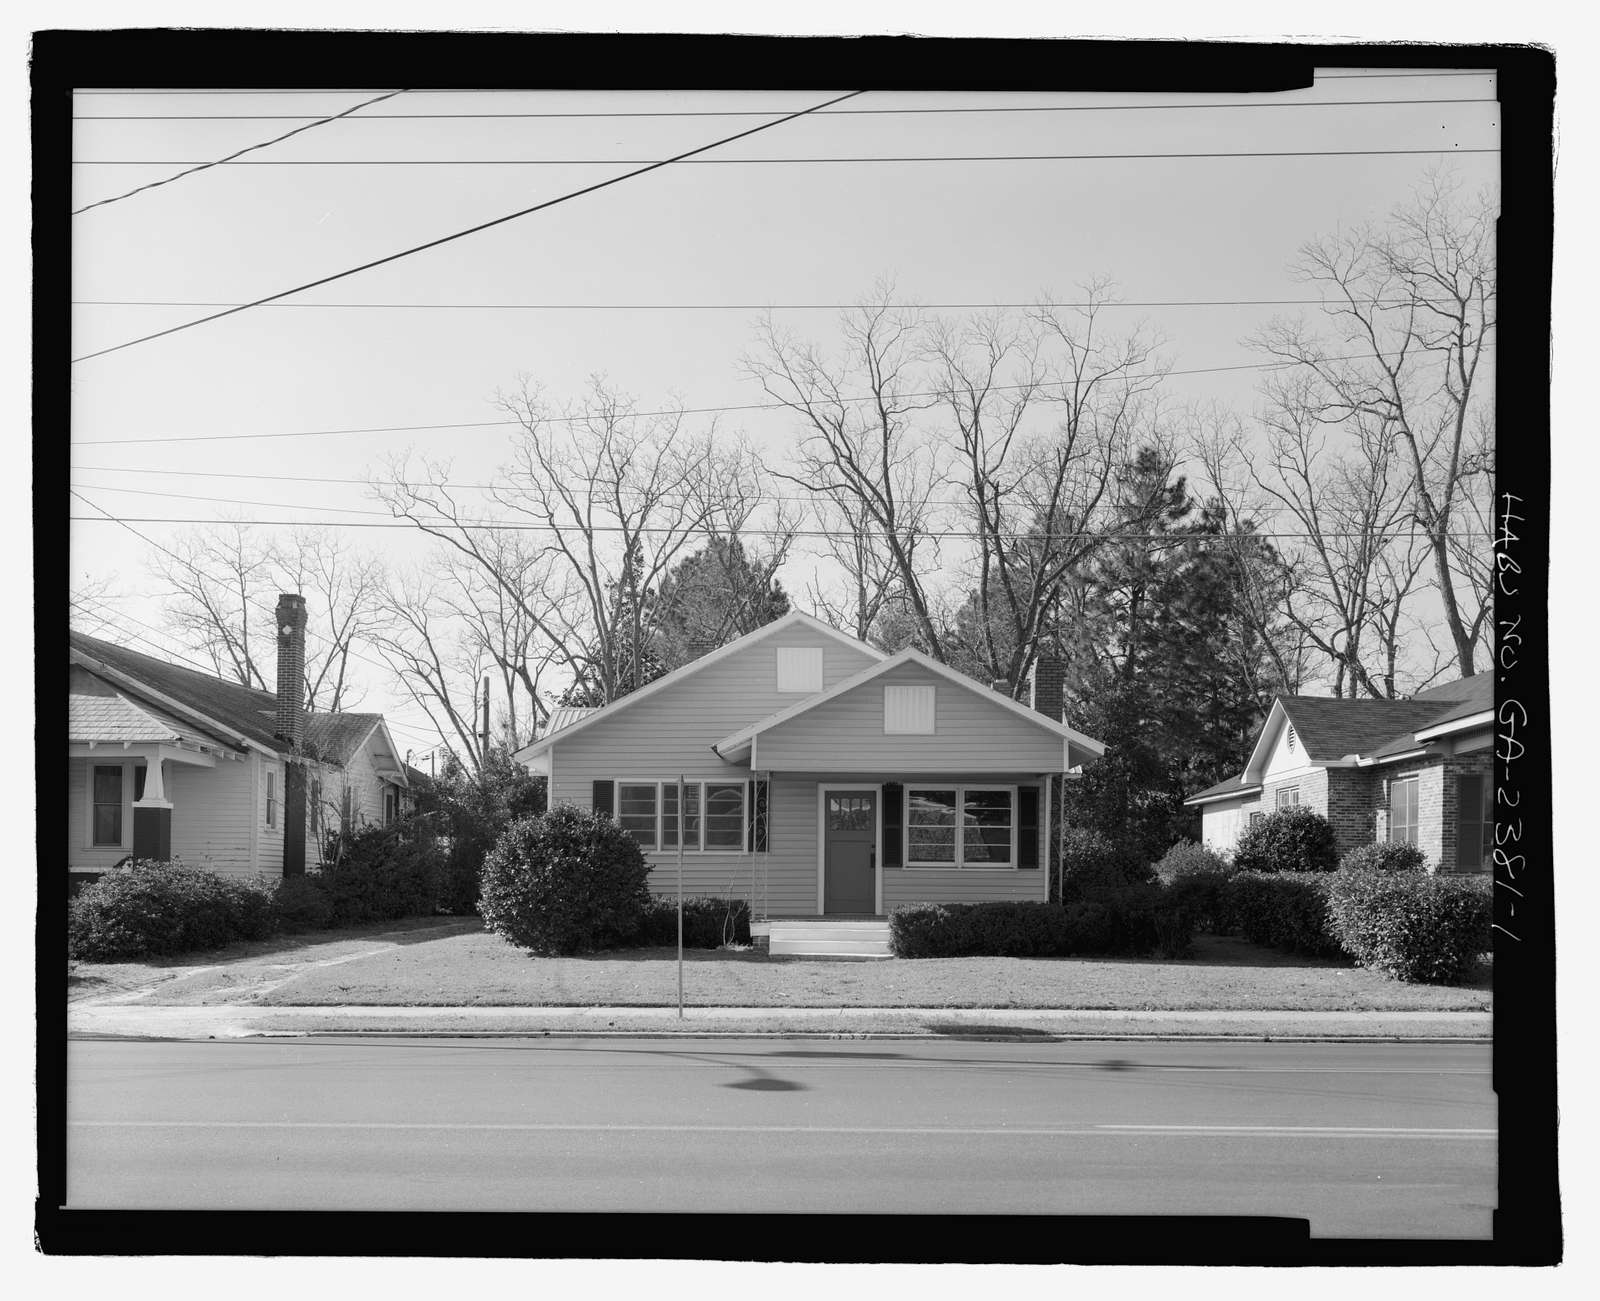 Raleigh Brannen House, 339 South Main Street, Statesboro, Bulloch County, GA